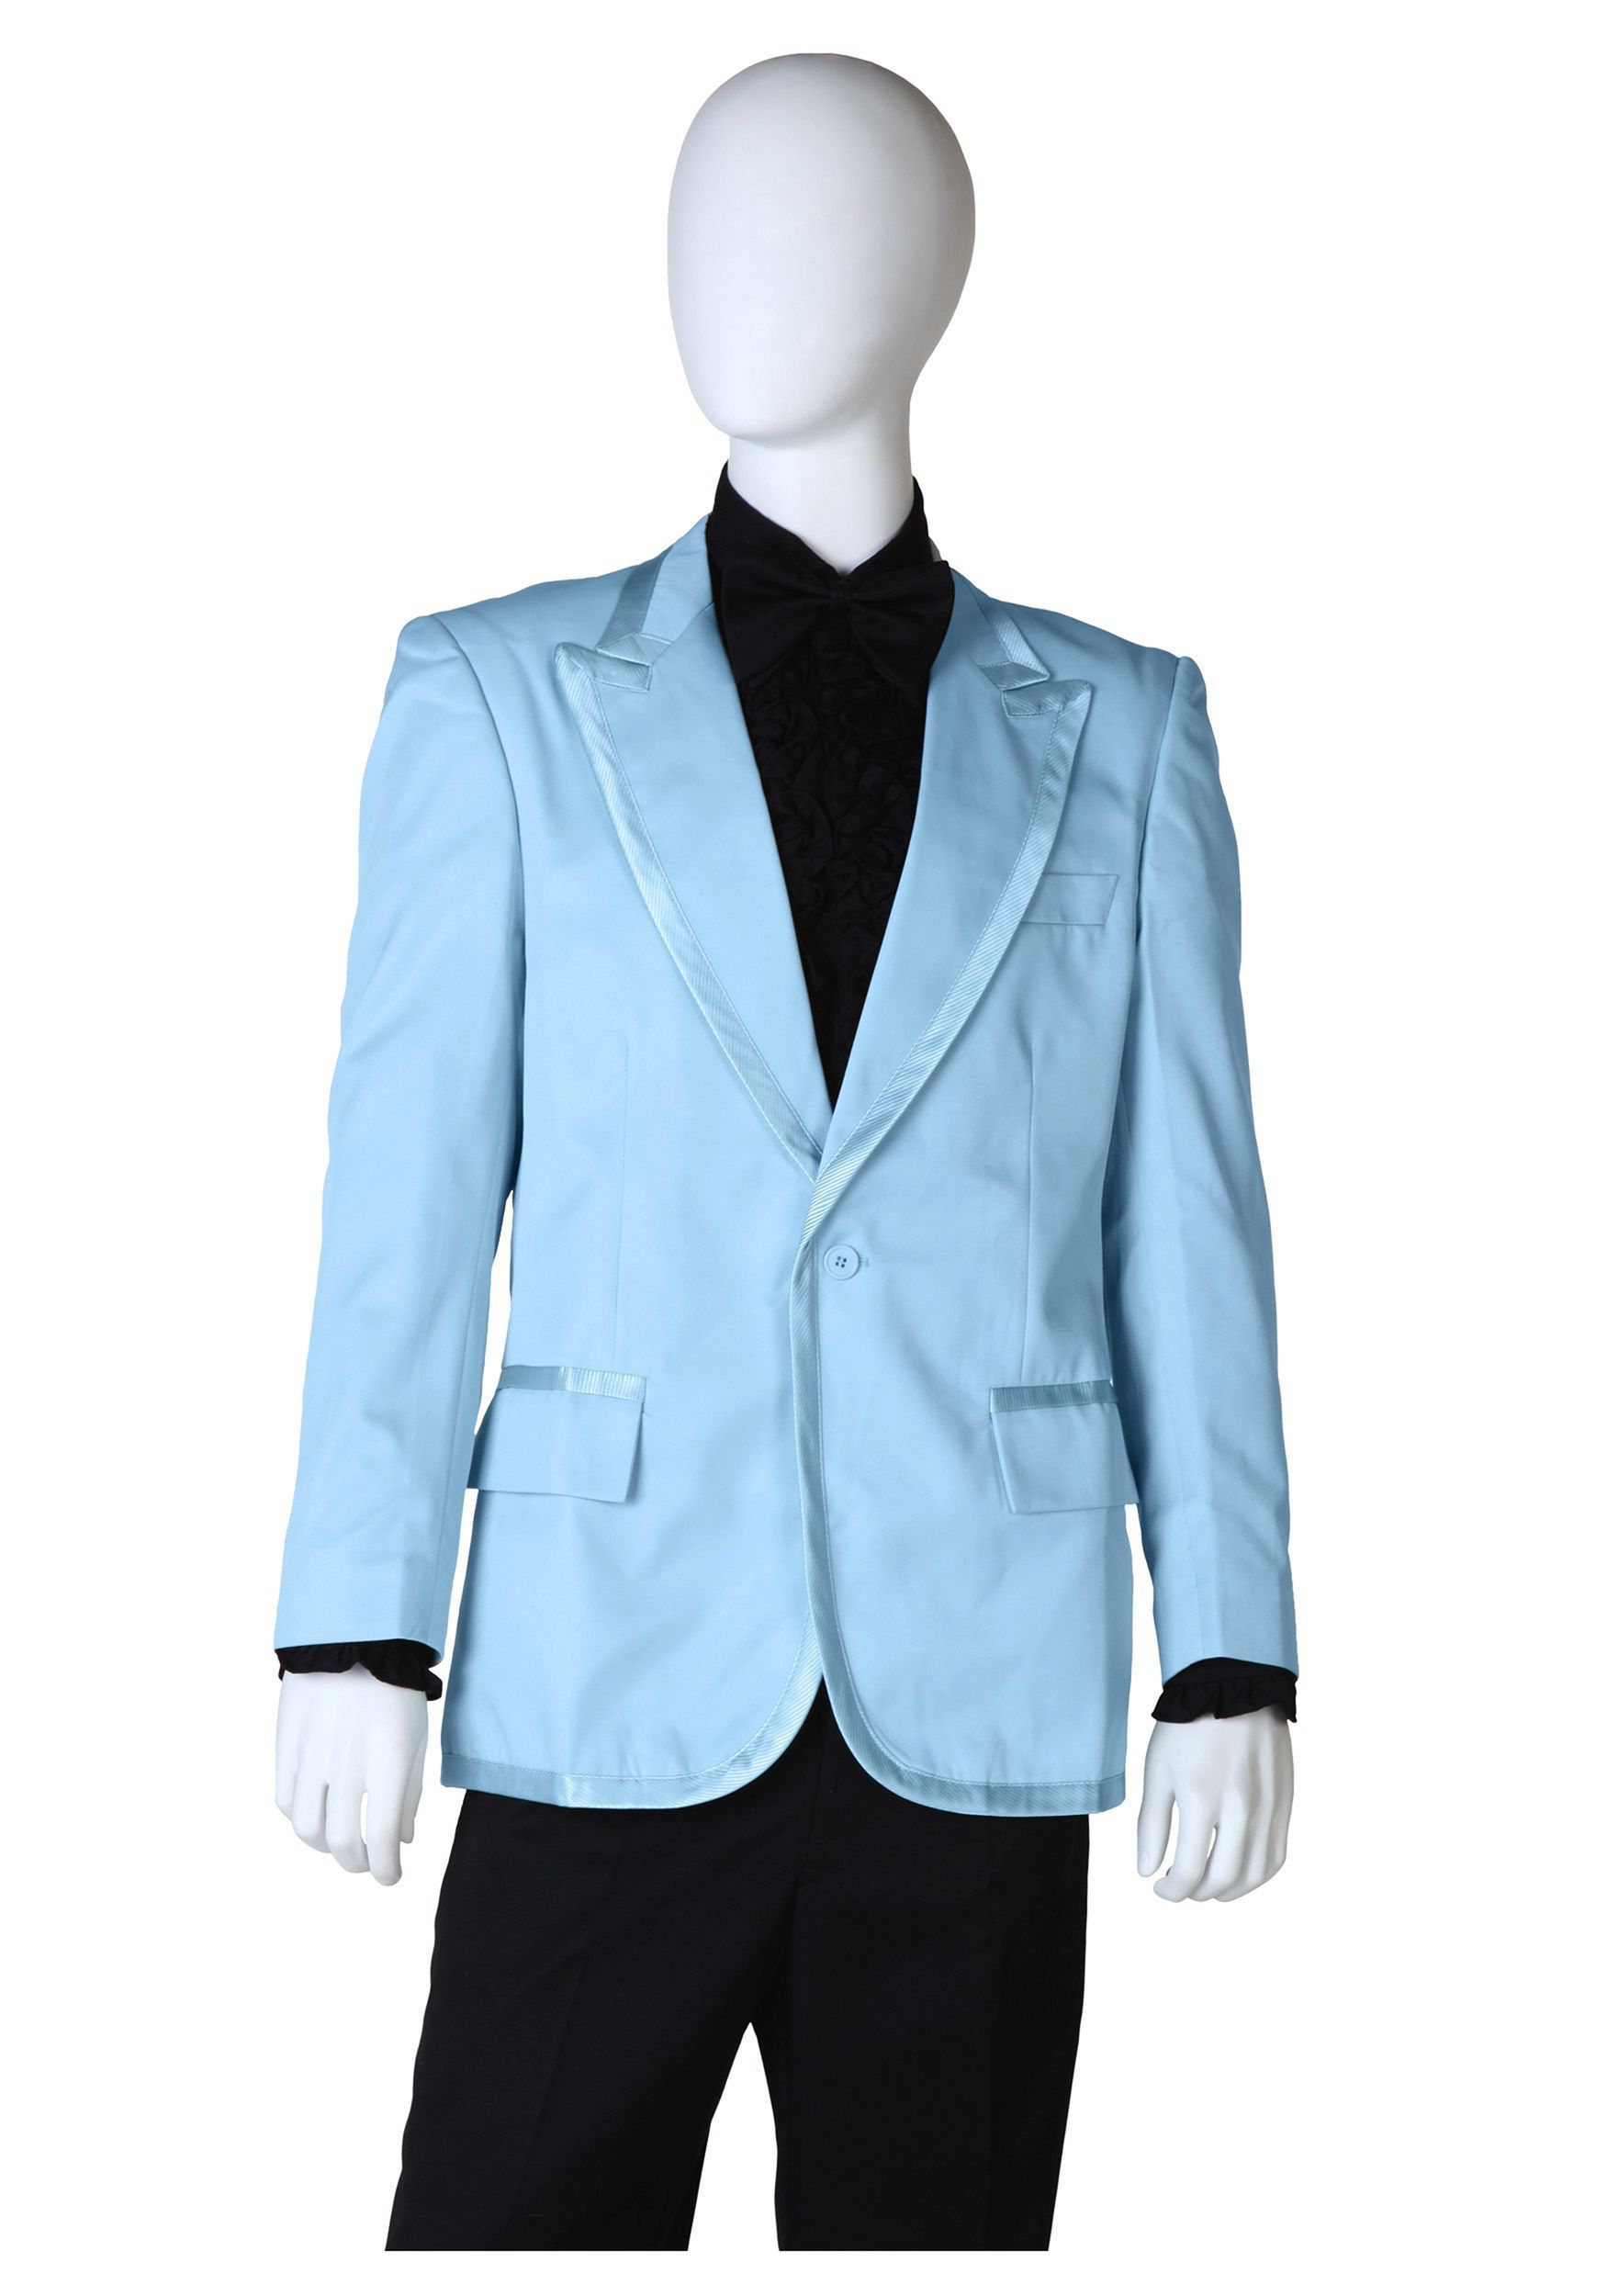 45+ Best Wedding Dress Wear A Blue Tuxedo Ideas | Blue tuxedos ...